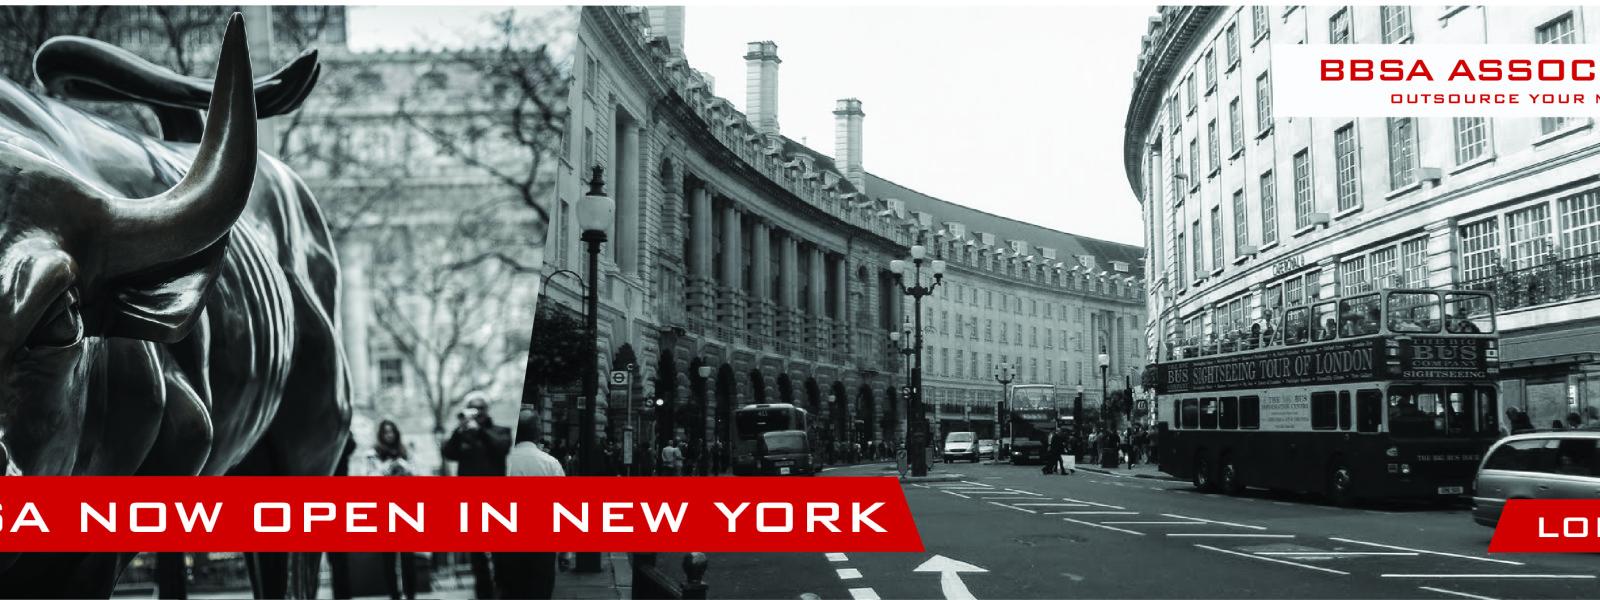 NY branch open in new york